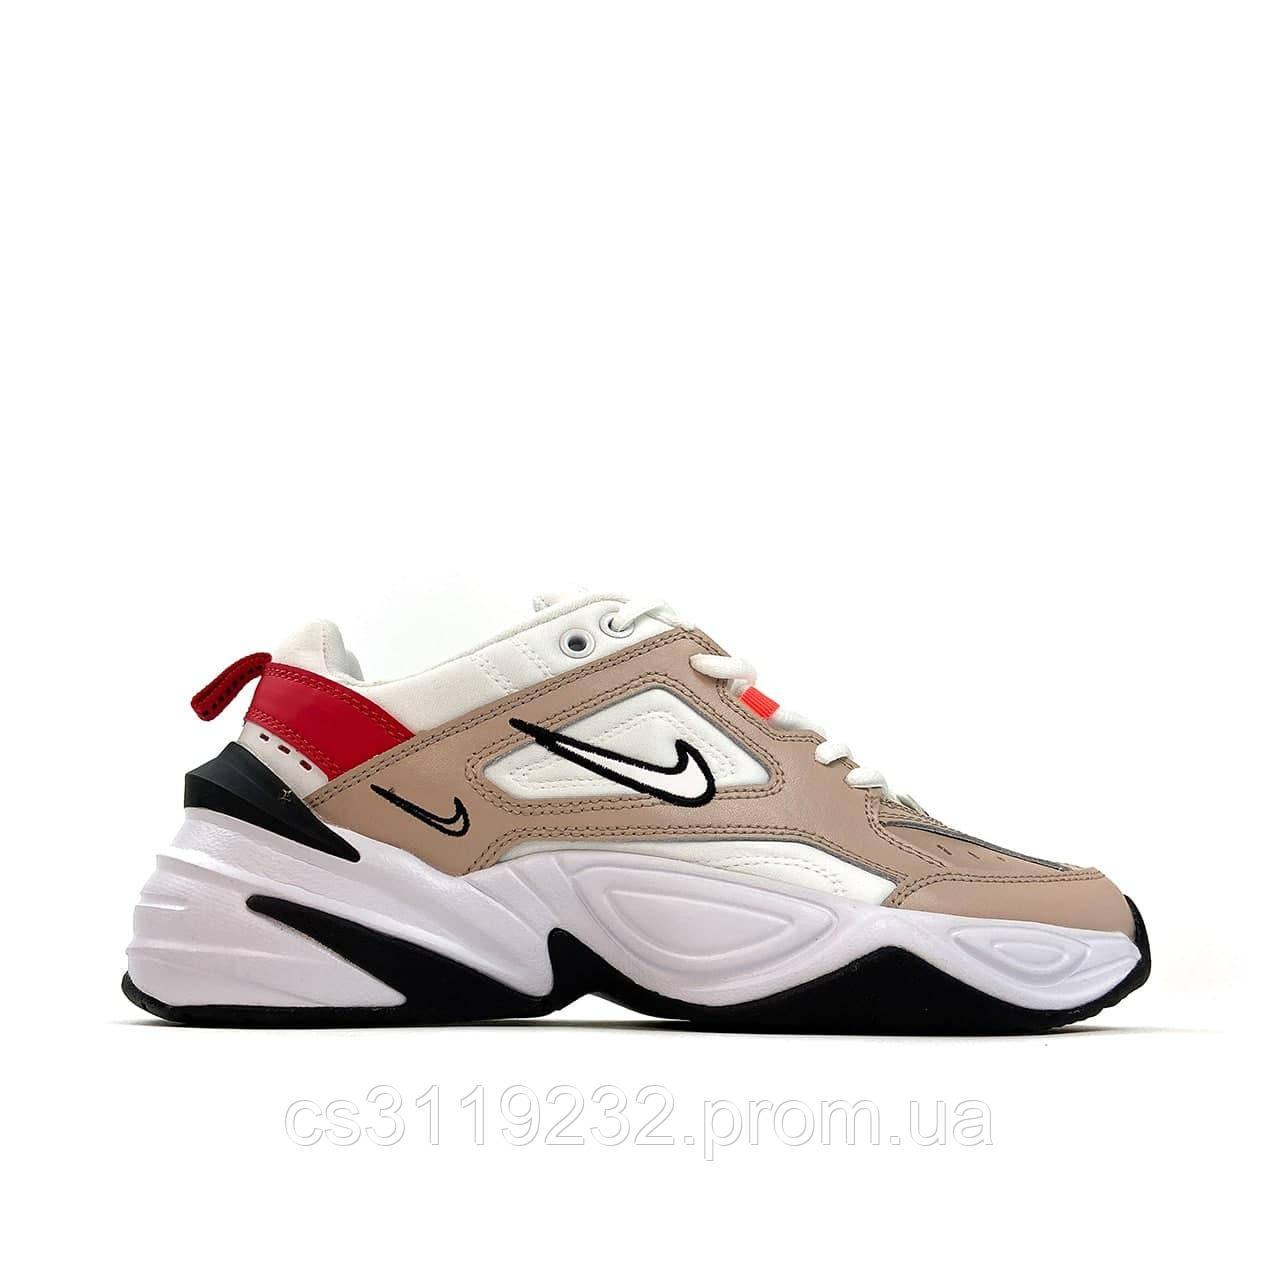 Мужские кроссовки Nike M2K Tekno White Beige (бежевый)